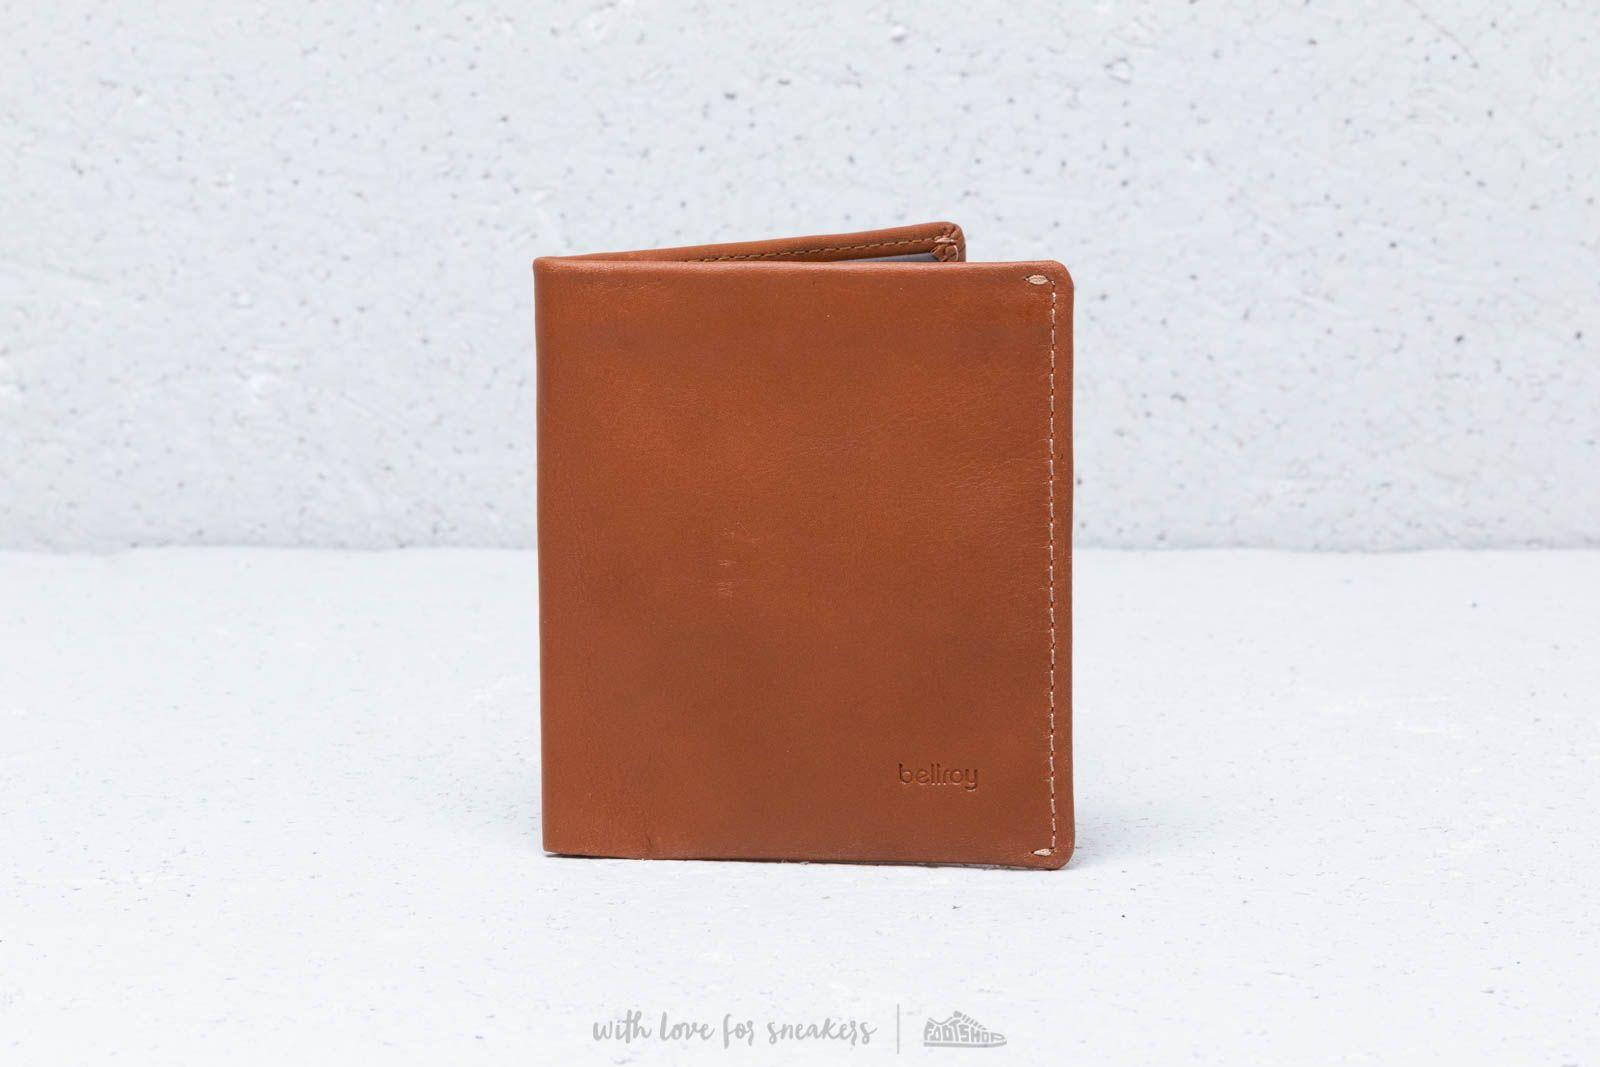 Bellroy Note Sleeve Wallet Caramel